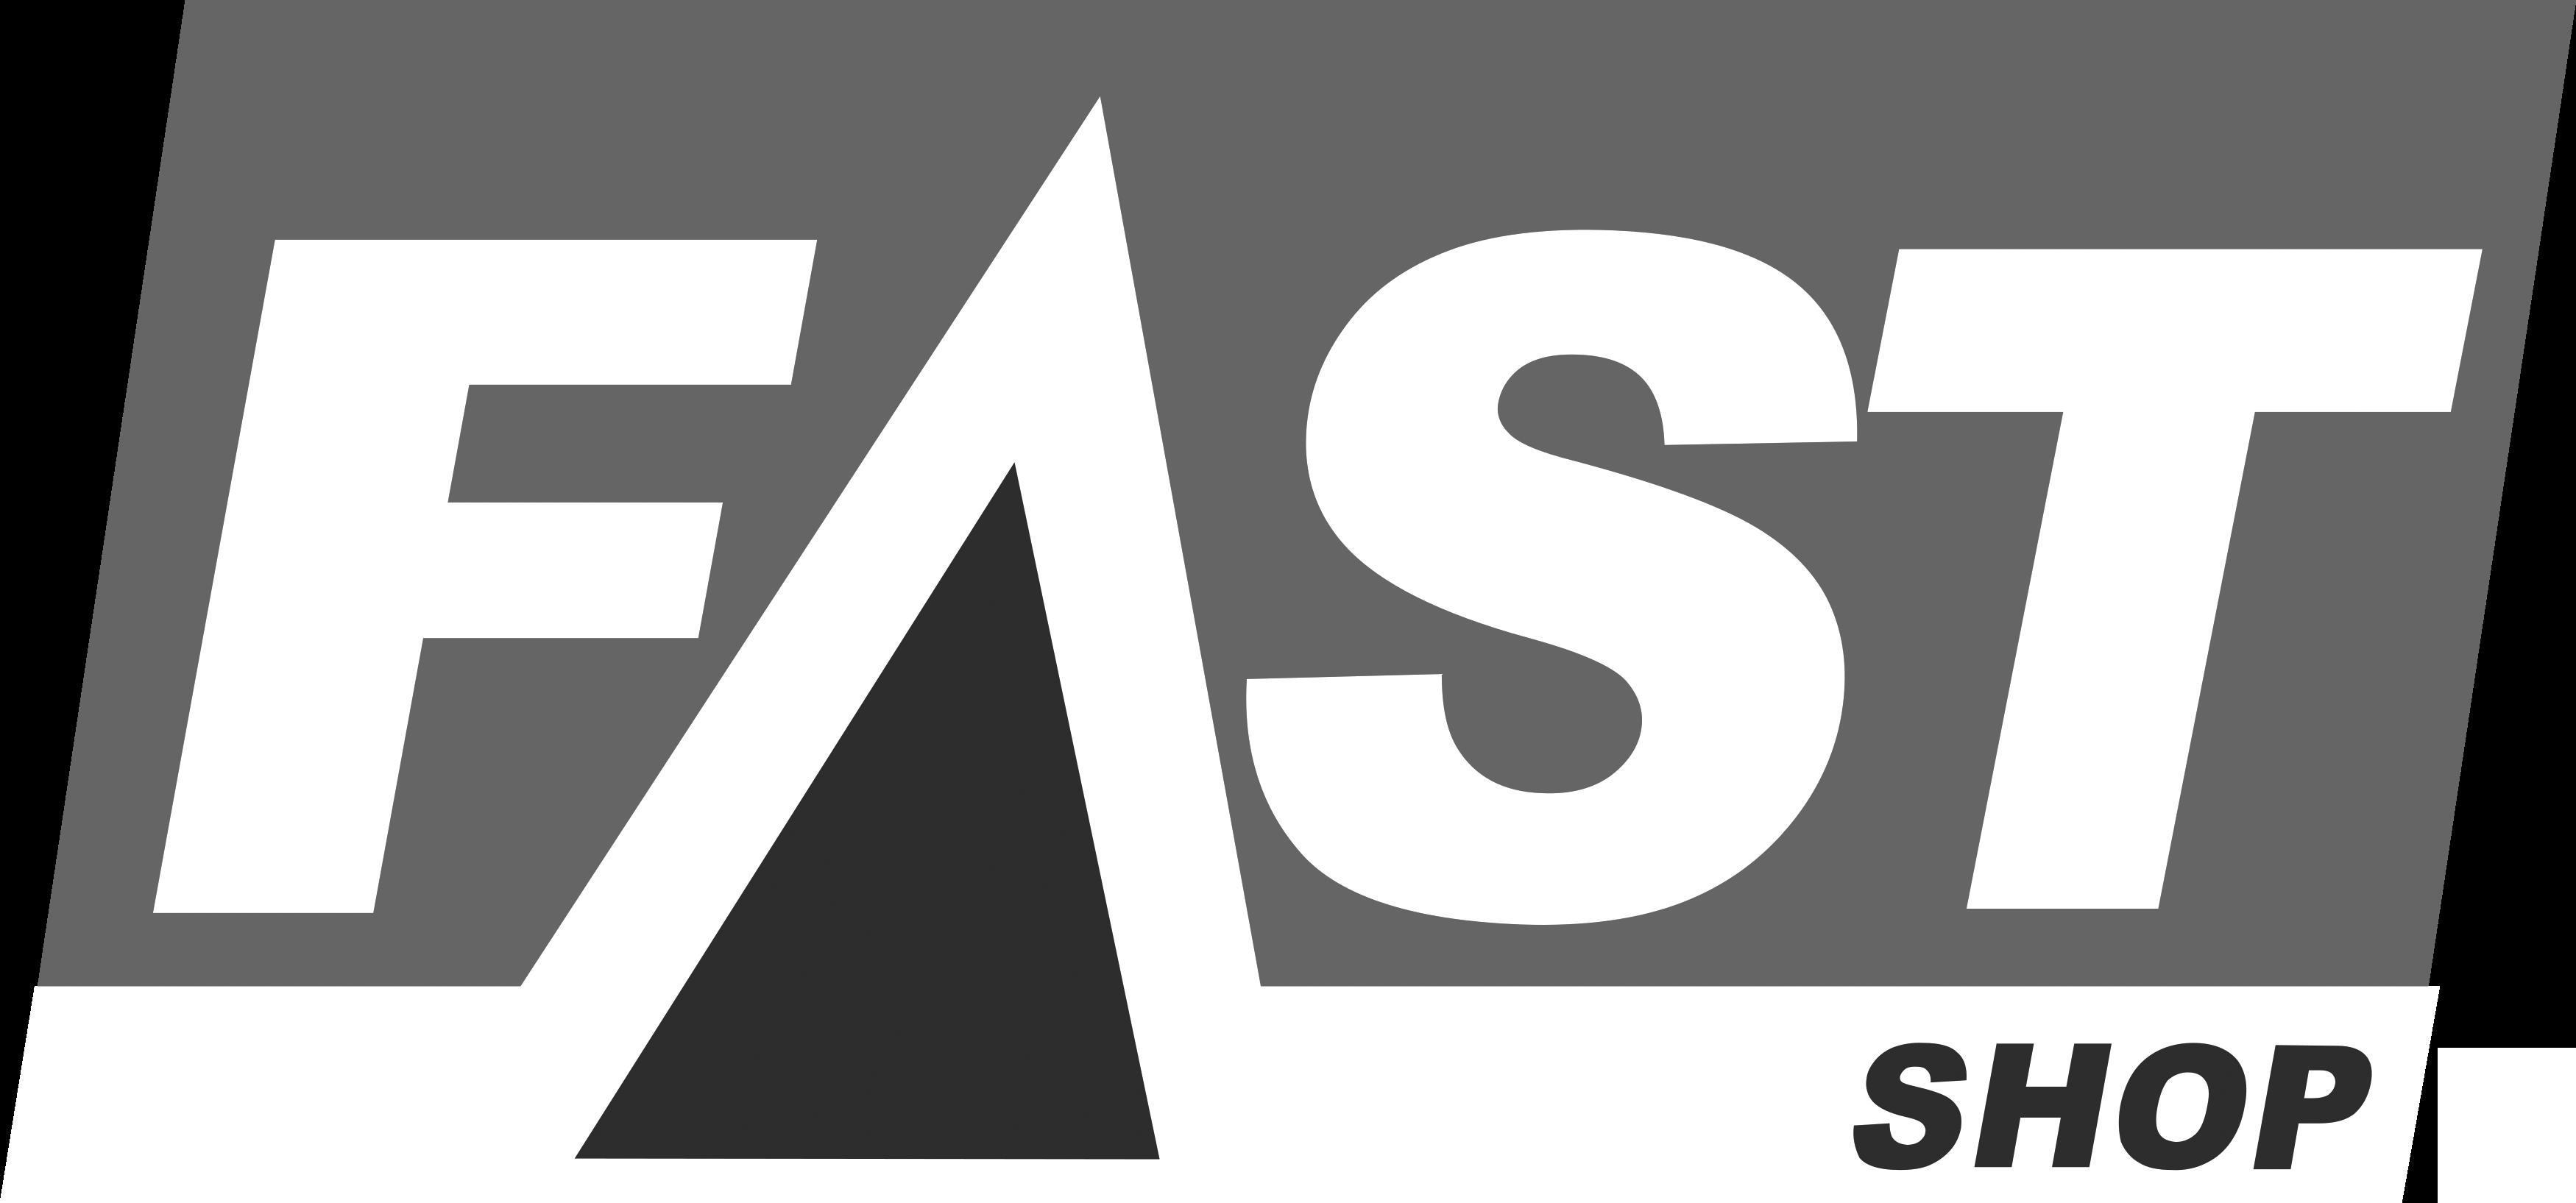 fast-shop-logo_pb.png